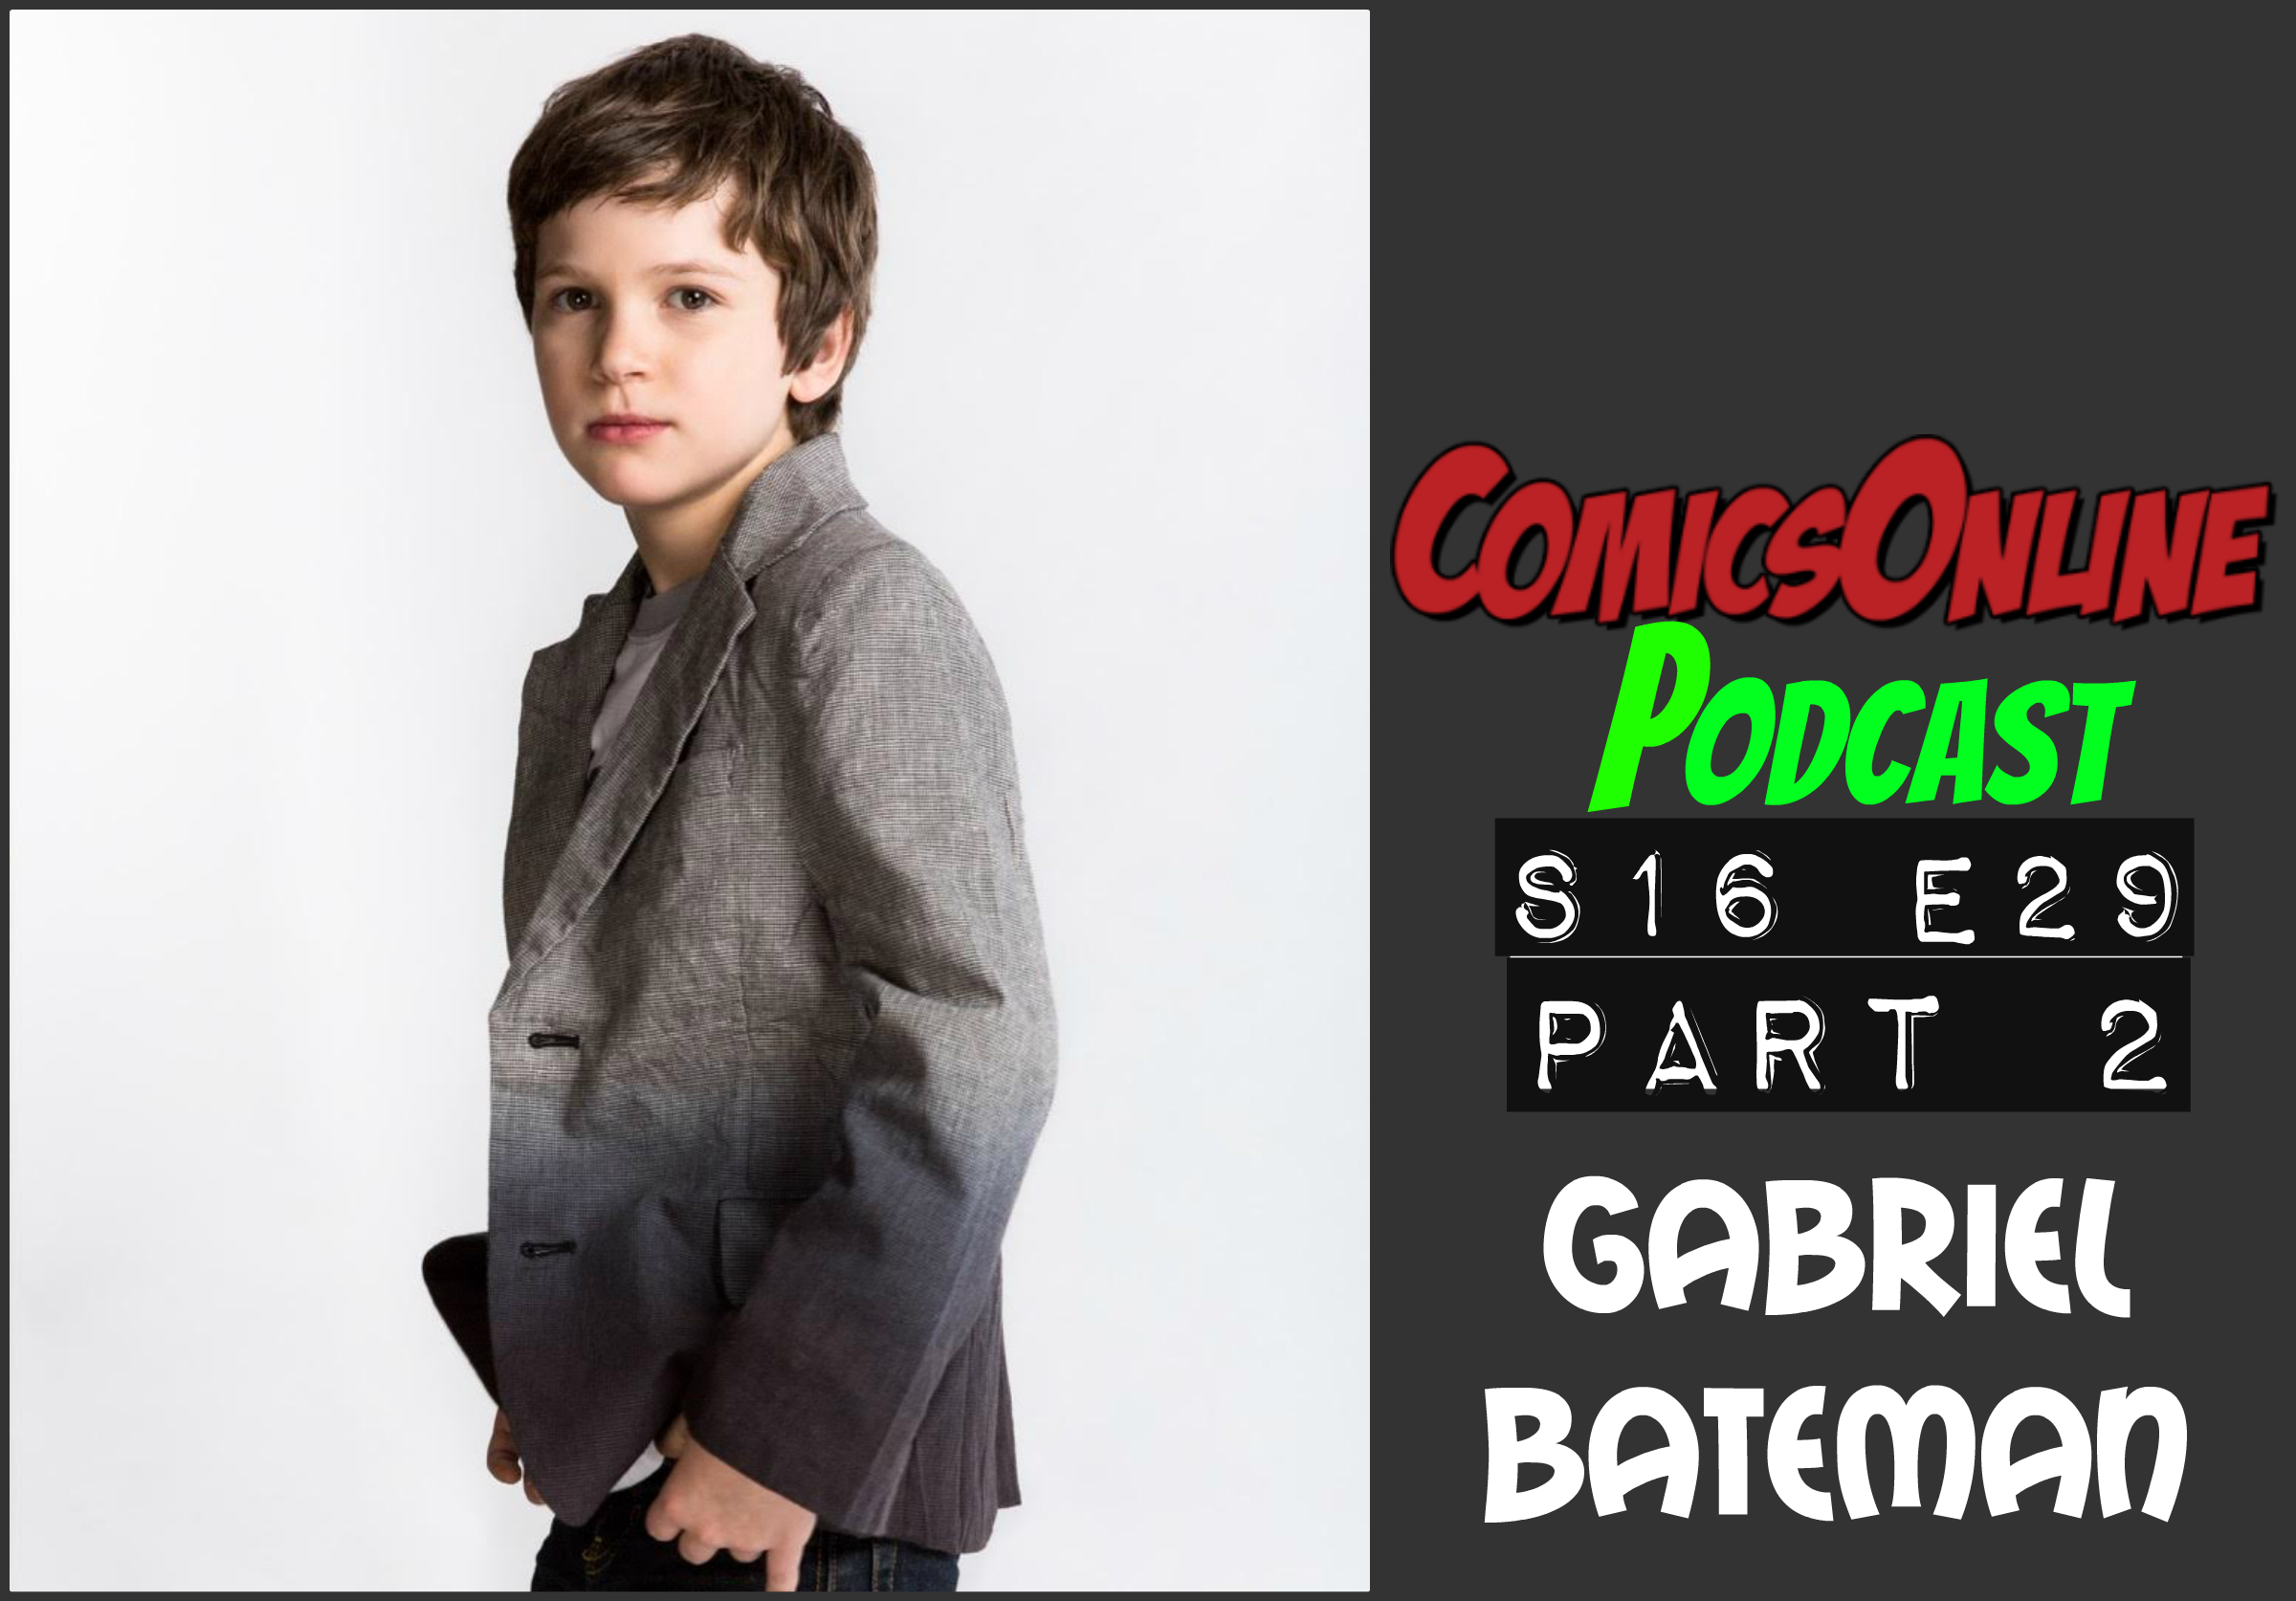 gabriel bateman outcast